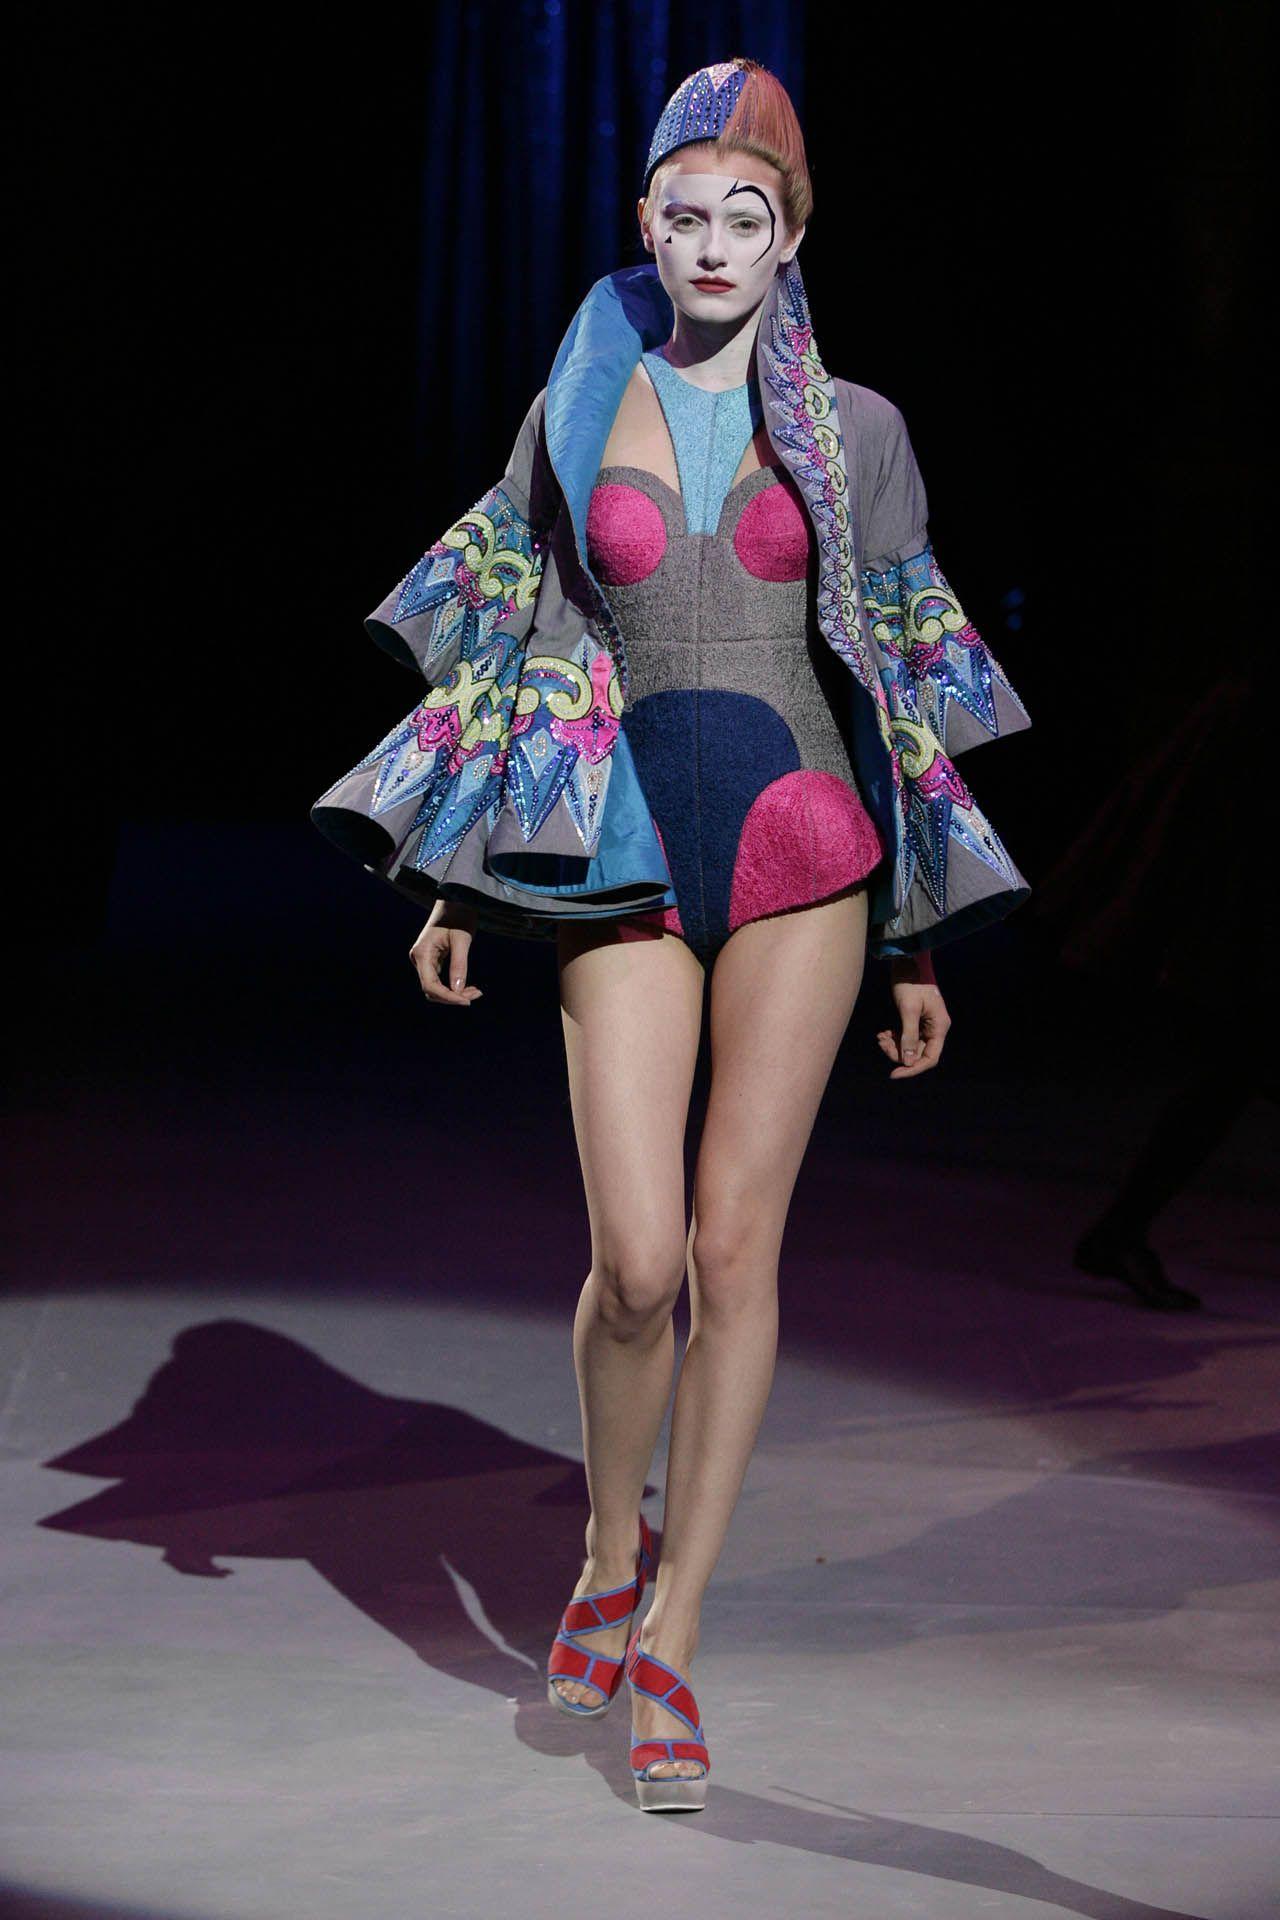 manish arora fashion - Google zoeken